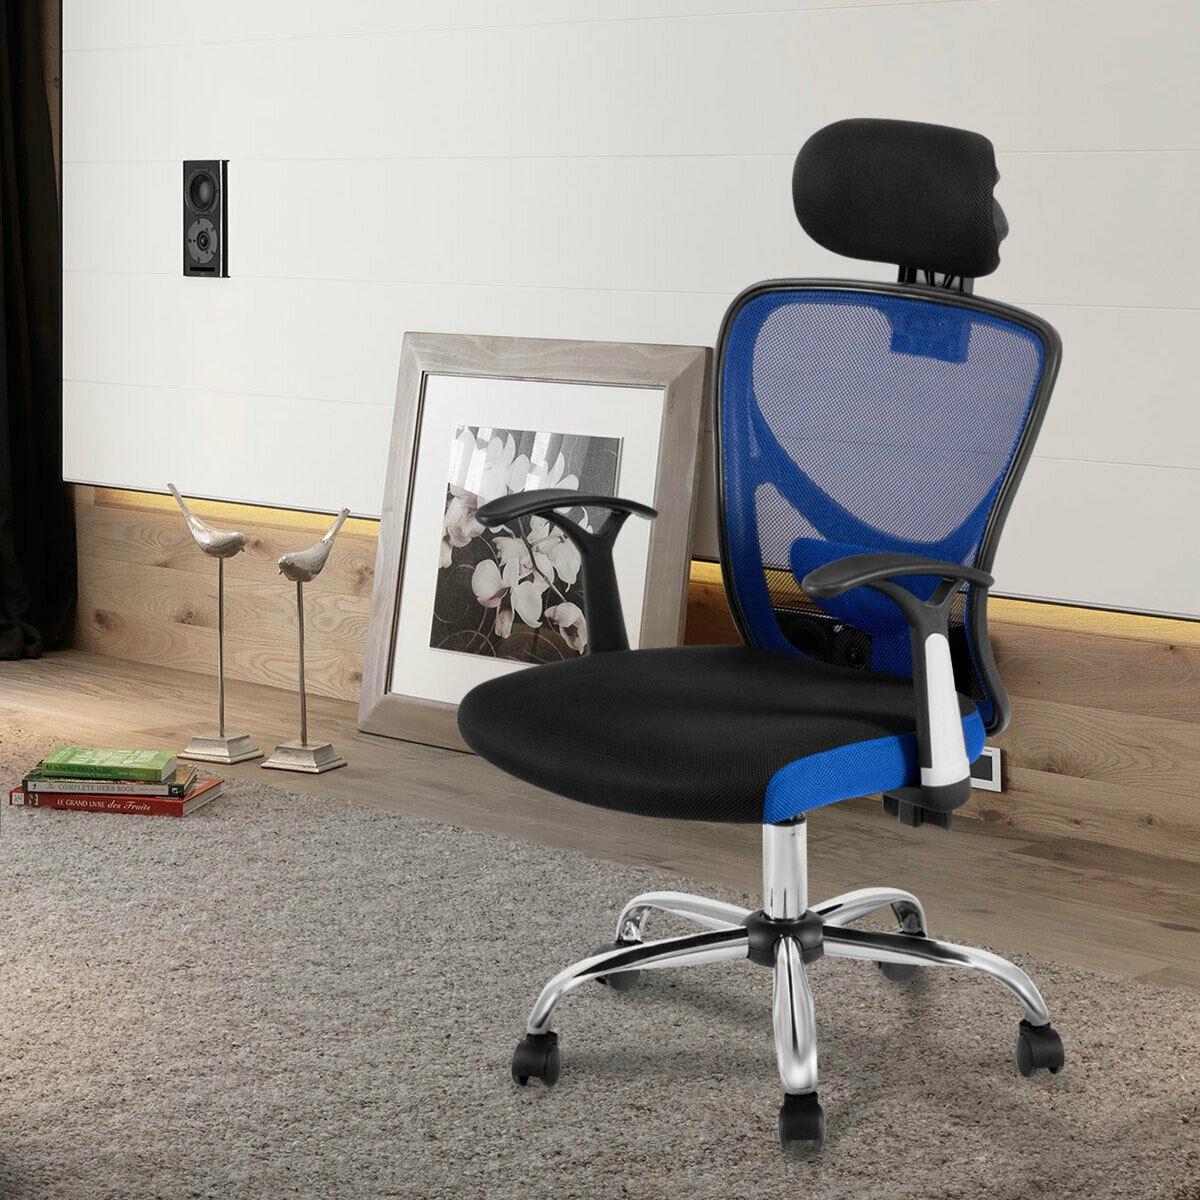 Ergonomic Mesh High Back Office Chair with Headrest